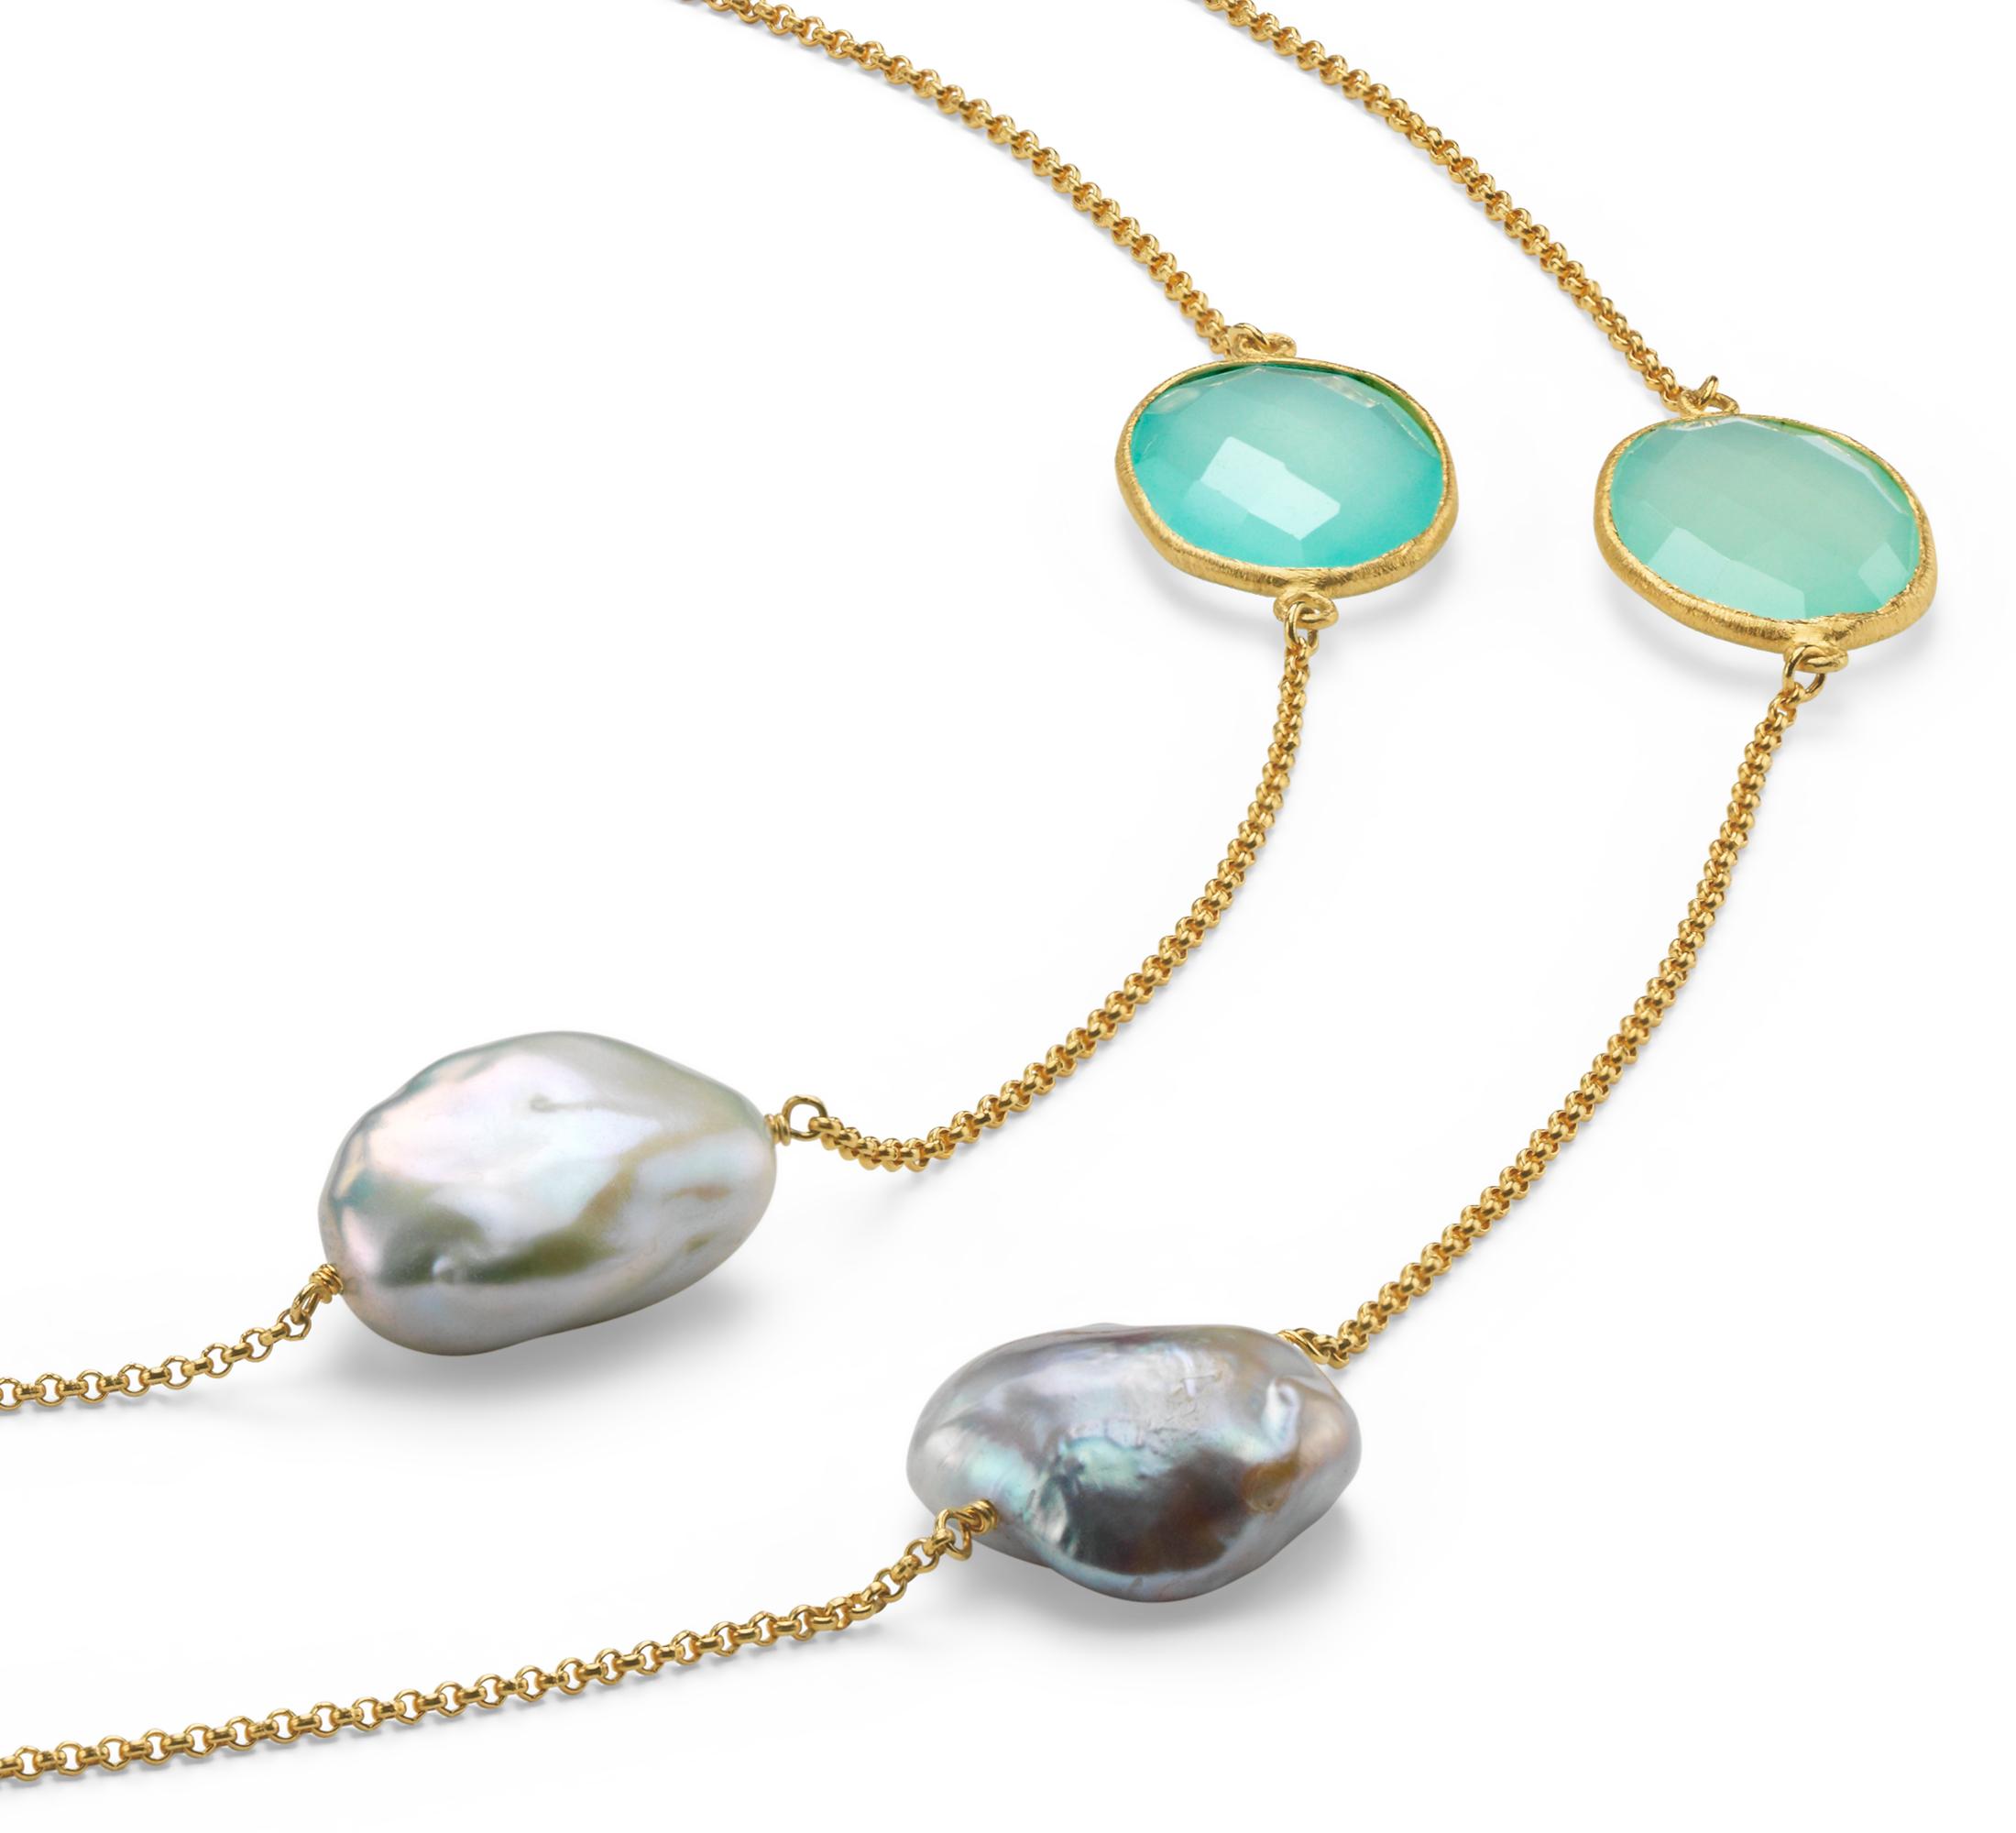 Collar de perlas cultivadas de agua dulce y calcedonia en plata bañada en oro